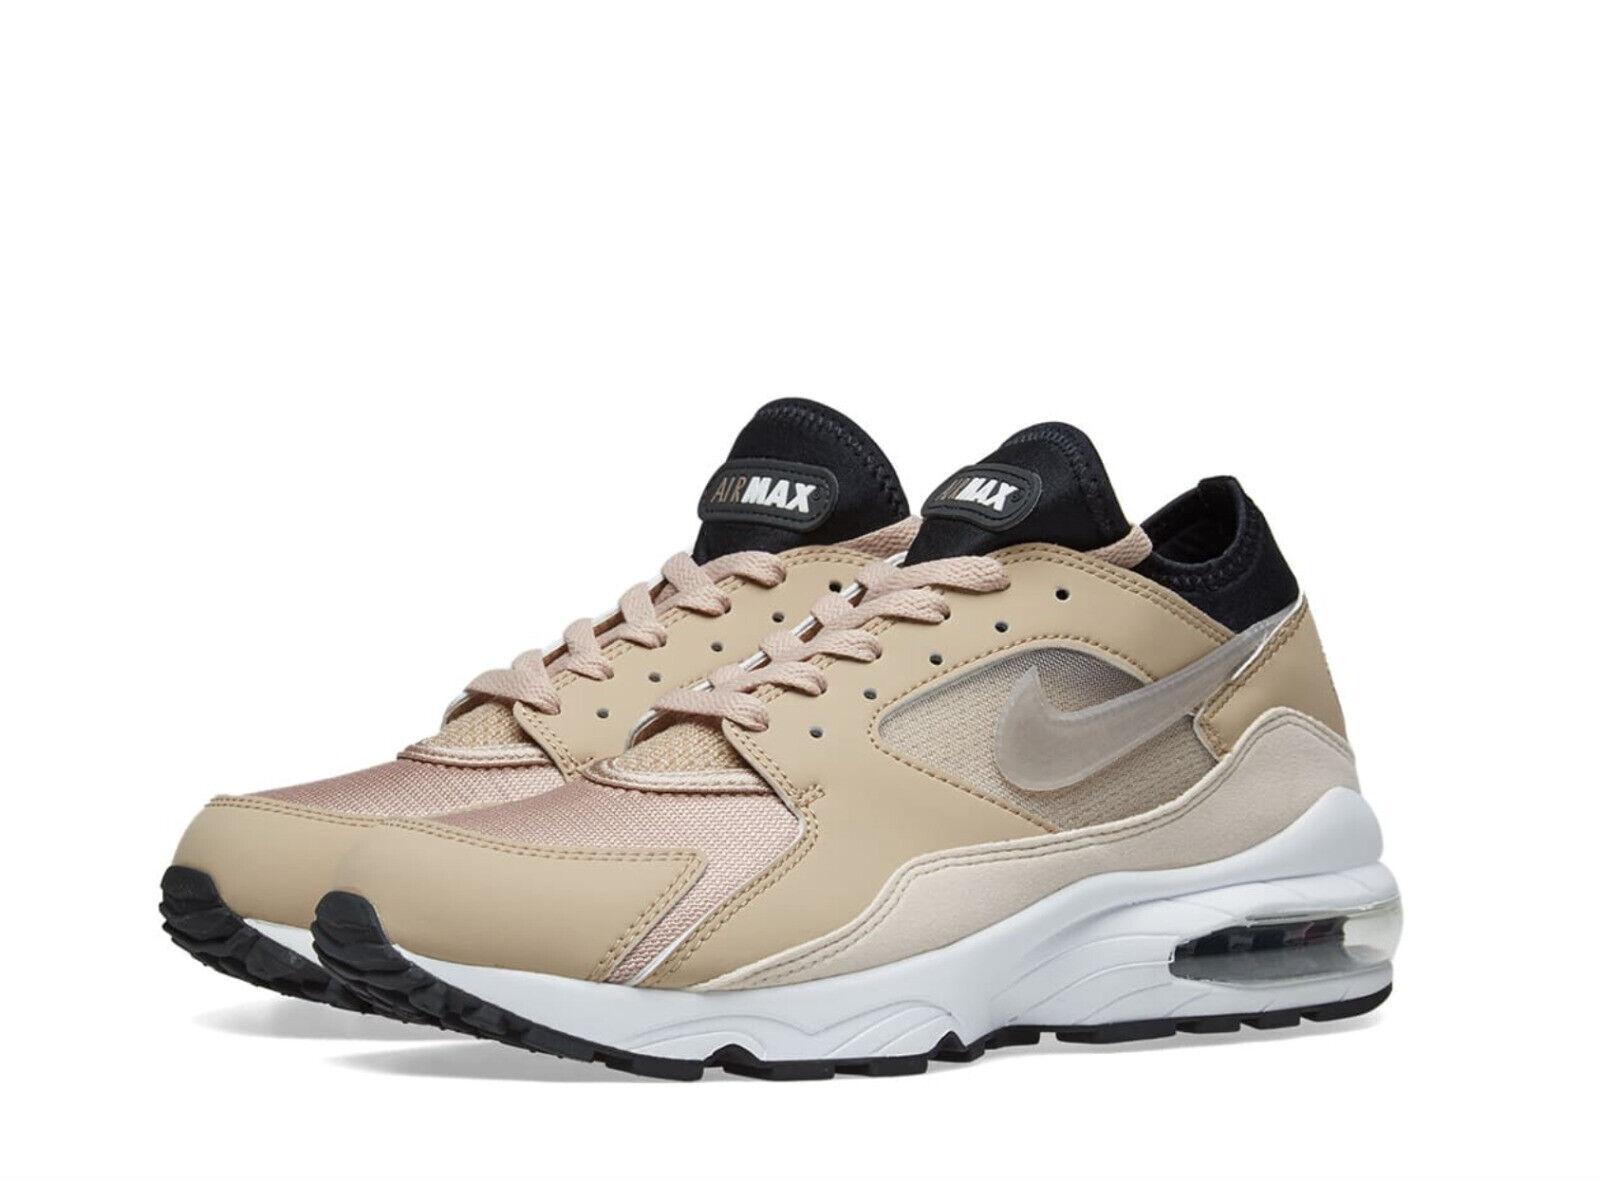 wholesale dealer 72feb e0888 Nike Air Max 93 Sepia Stone Stone Stone Men New Turnschuhe Mens Sand schuhe  306551-202 337094